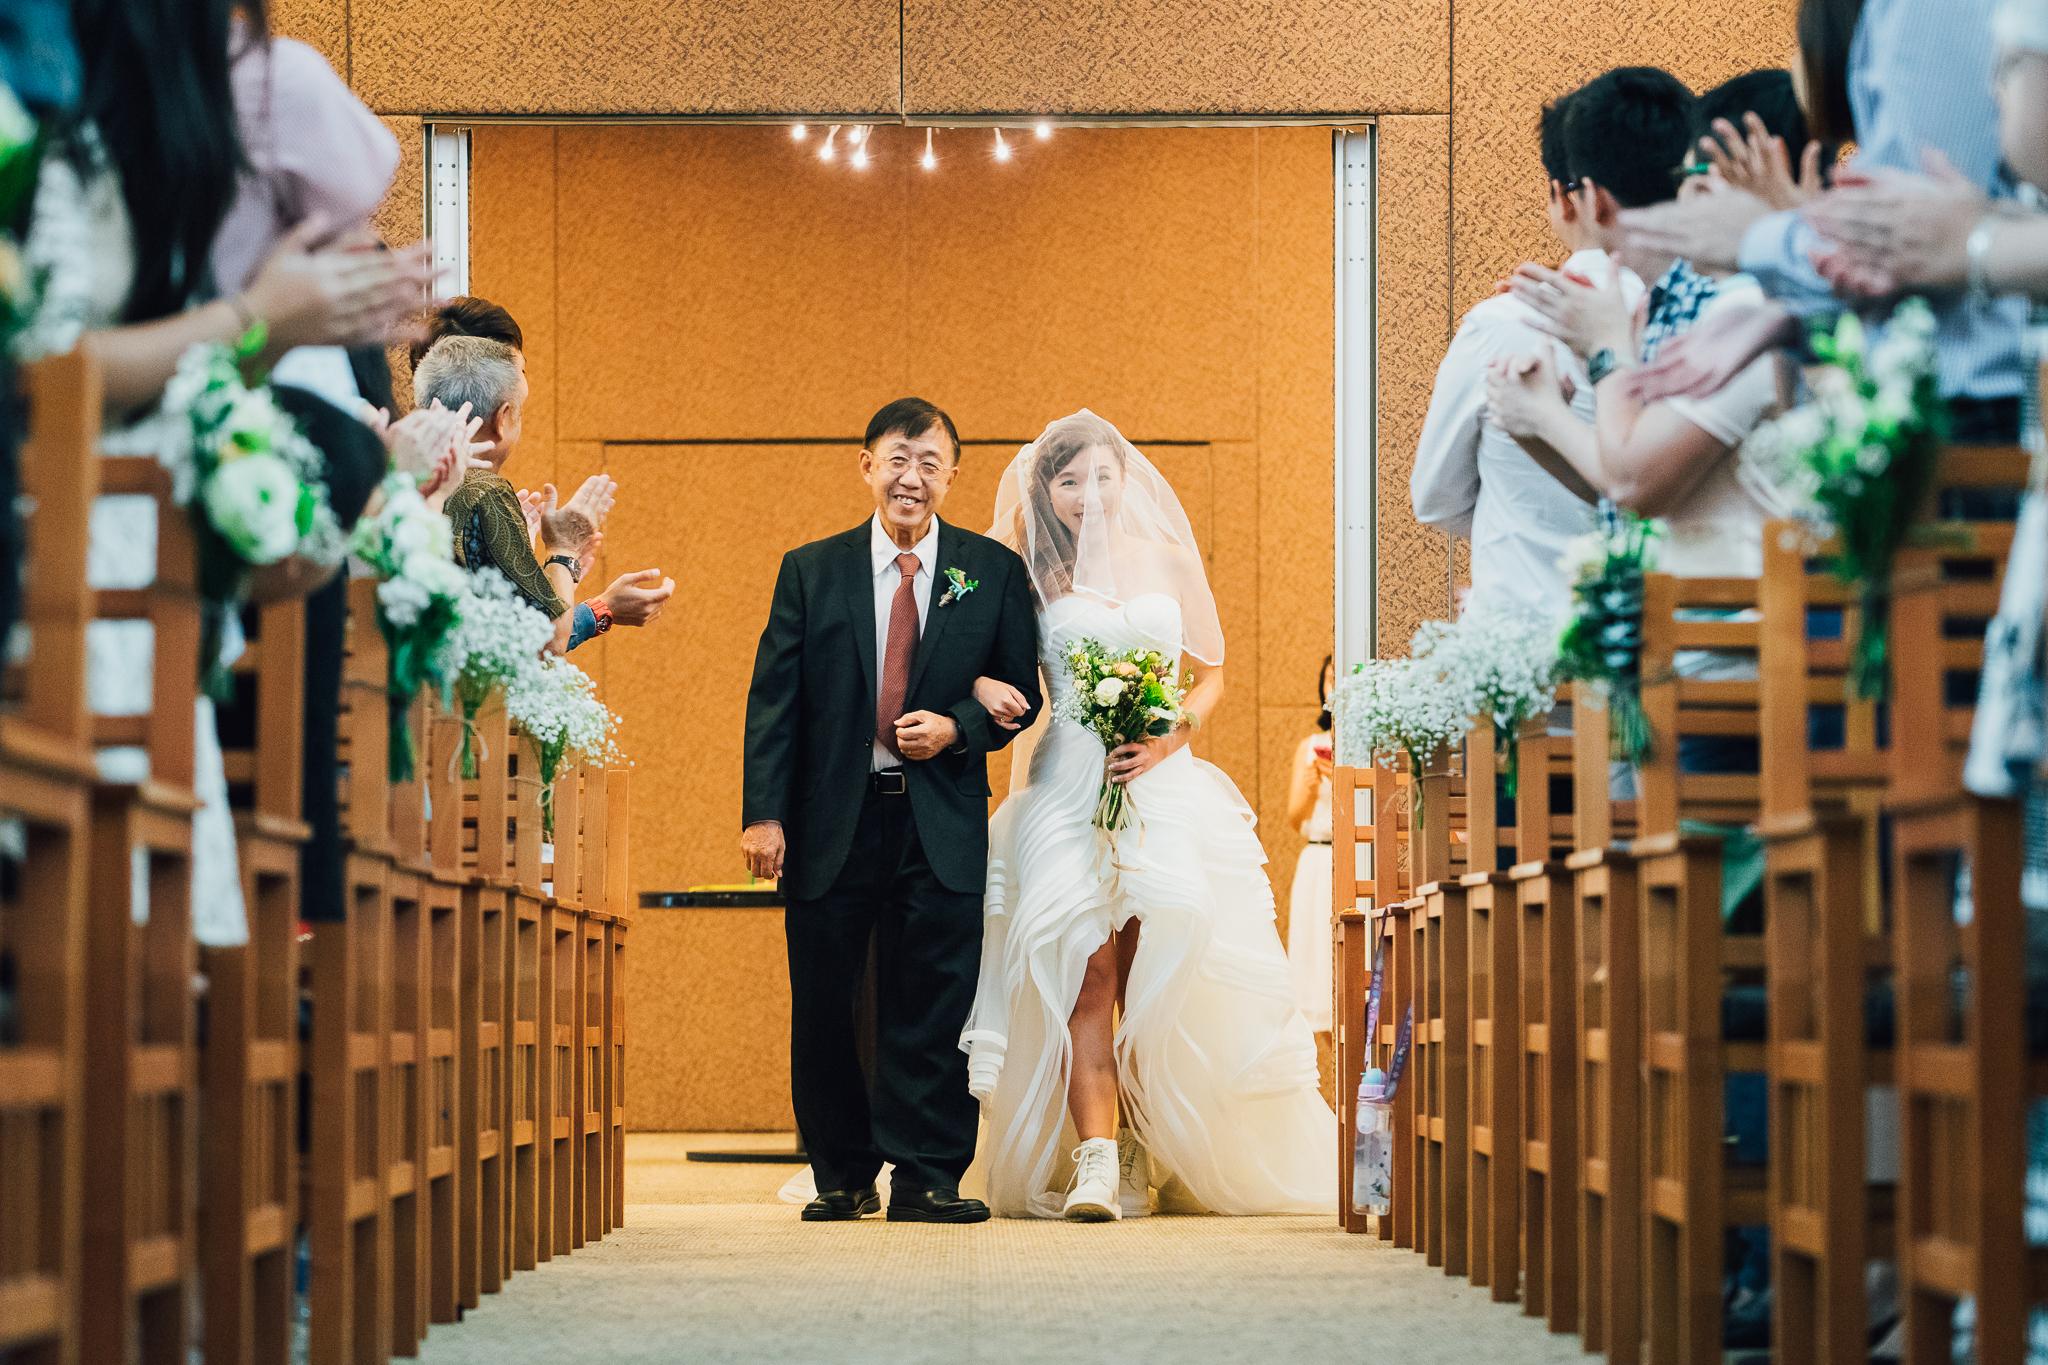 Singapore Wedding Photographer Colin & Lizzy Actual Day Wedding Holy Grace presbyterian church (76 of 127).JPG